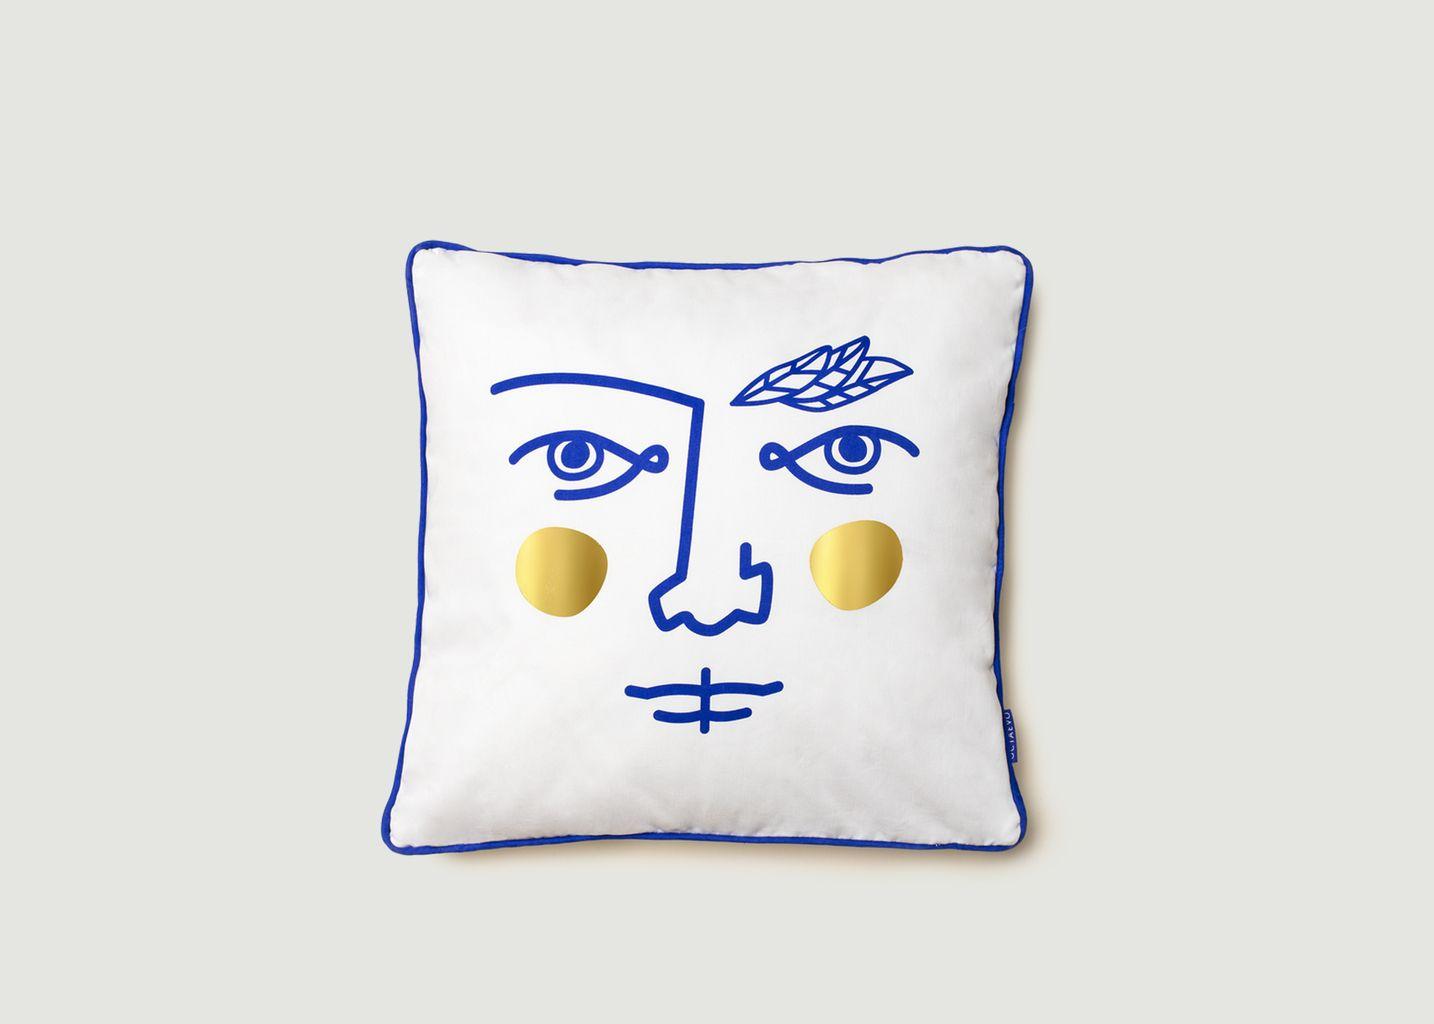 Janus Cushion Cover - Octaevo